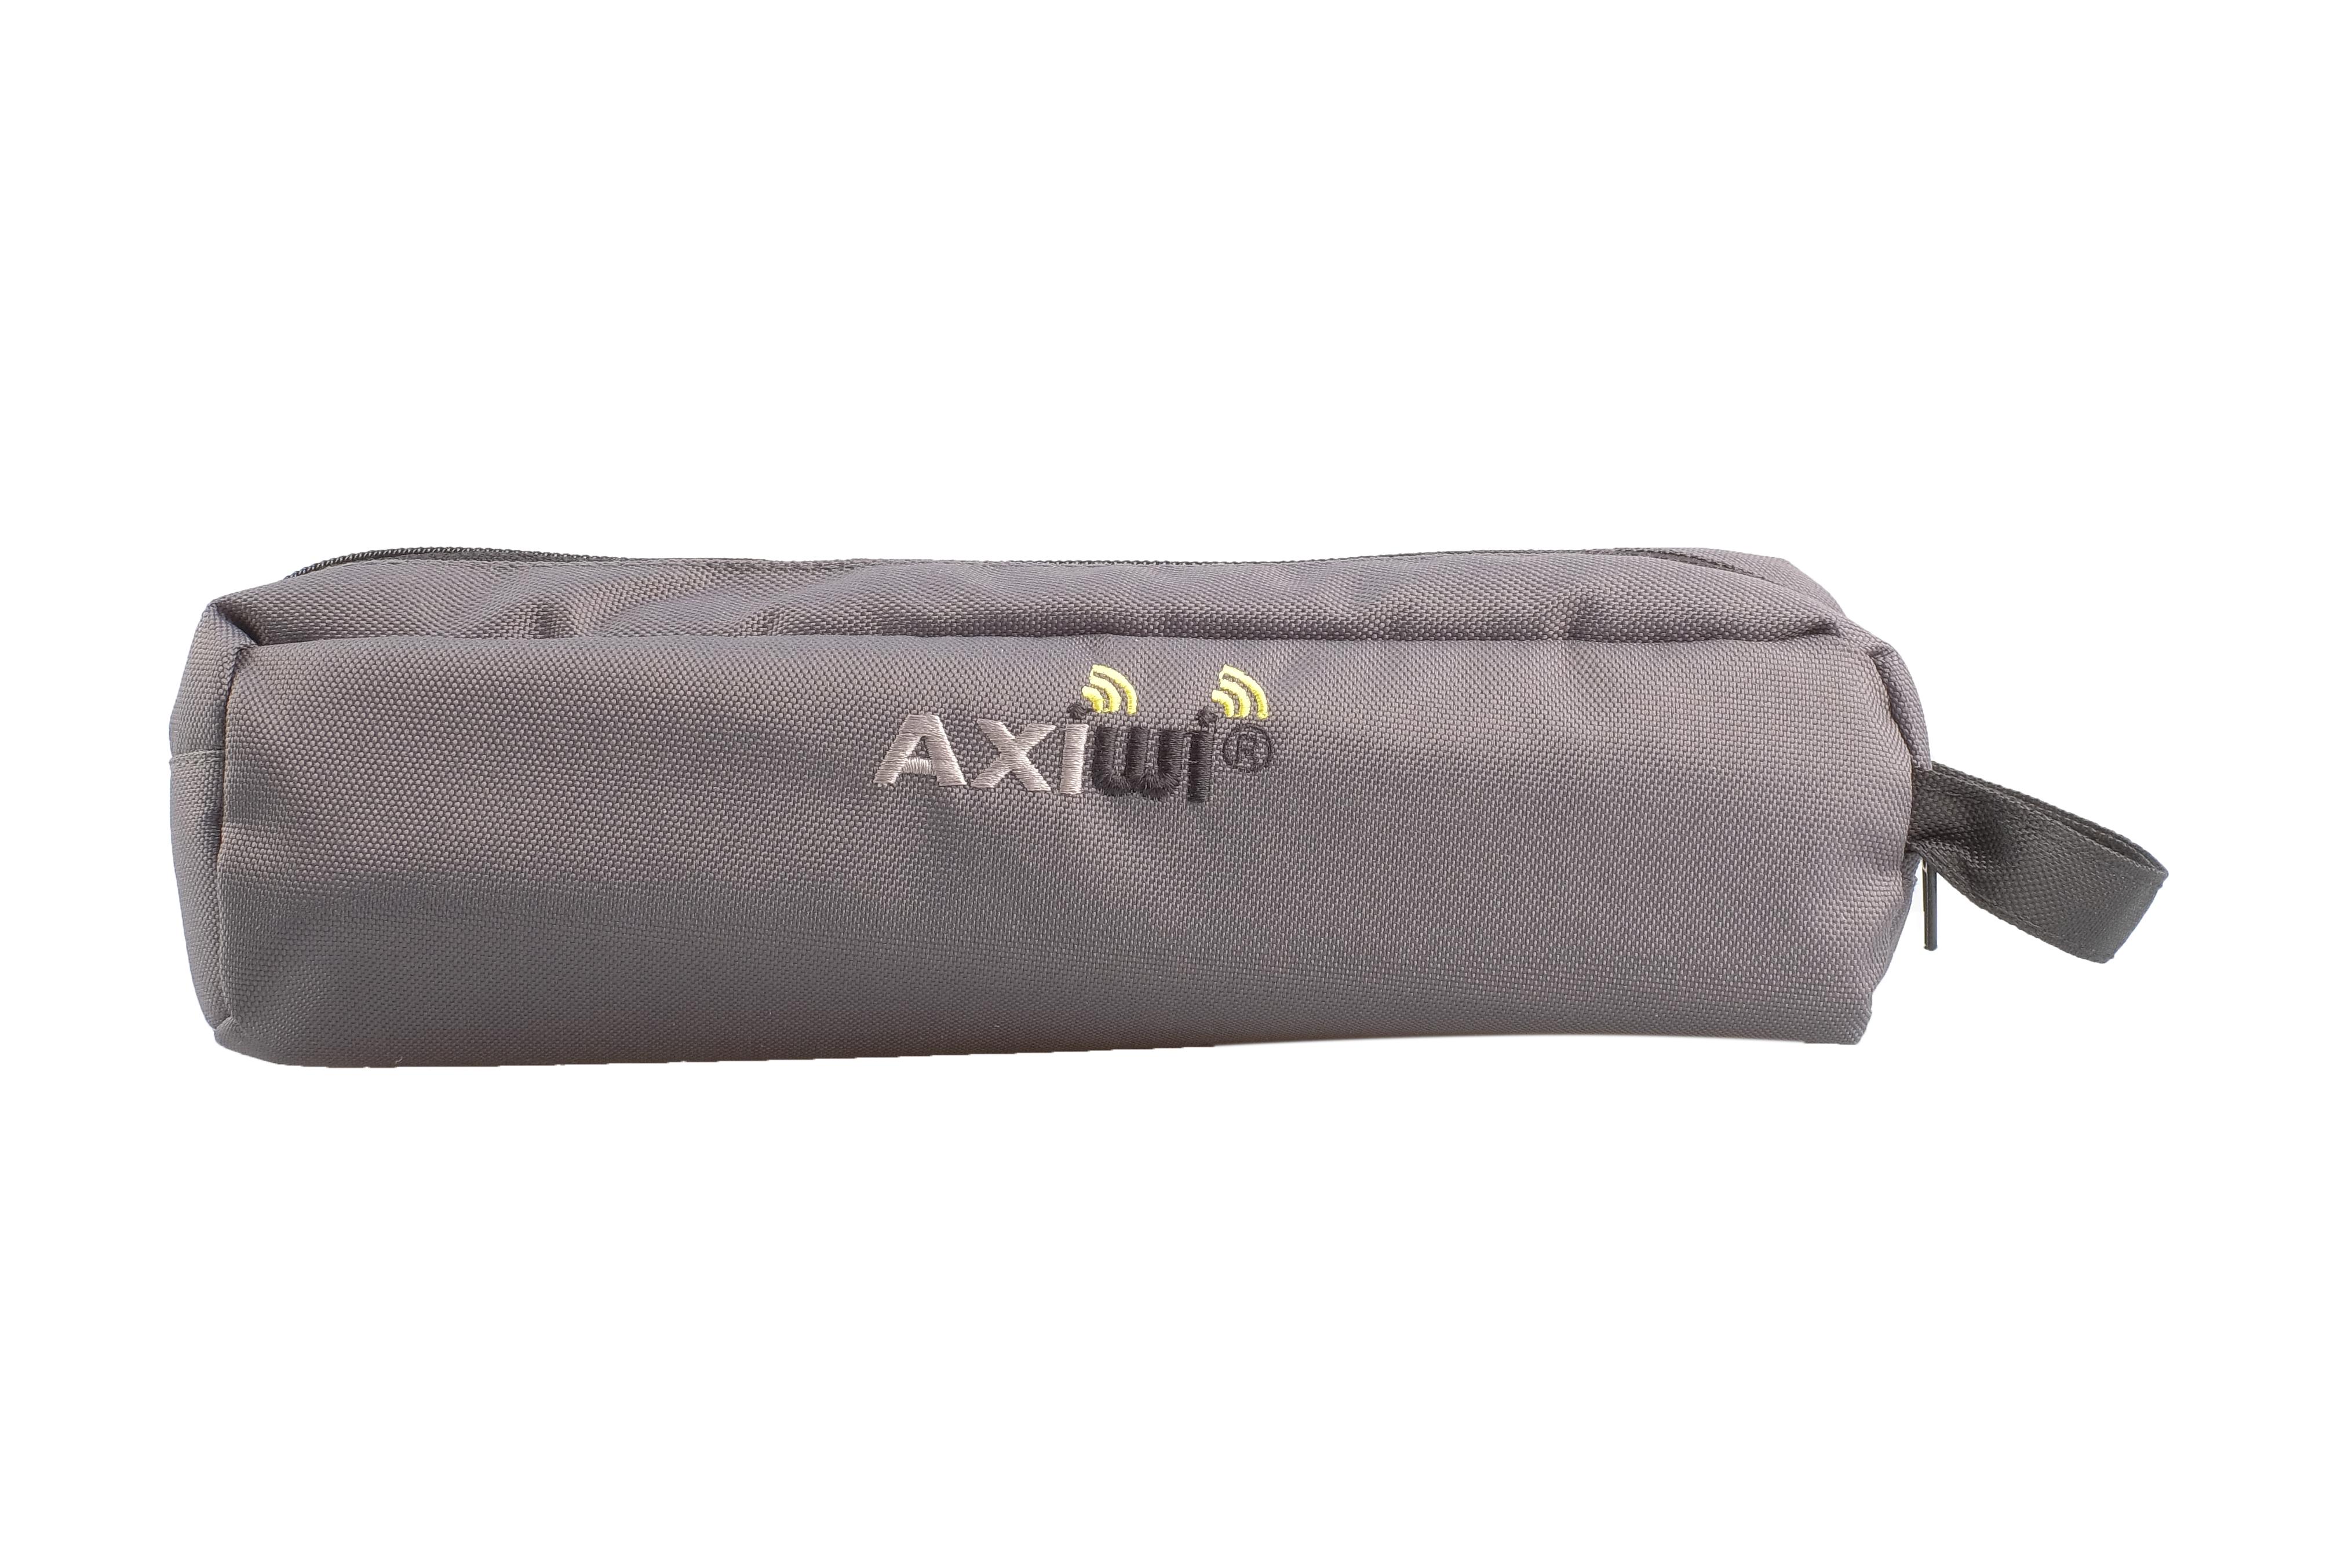 axiwi-ot-005